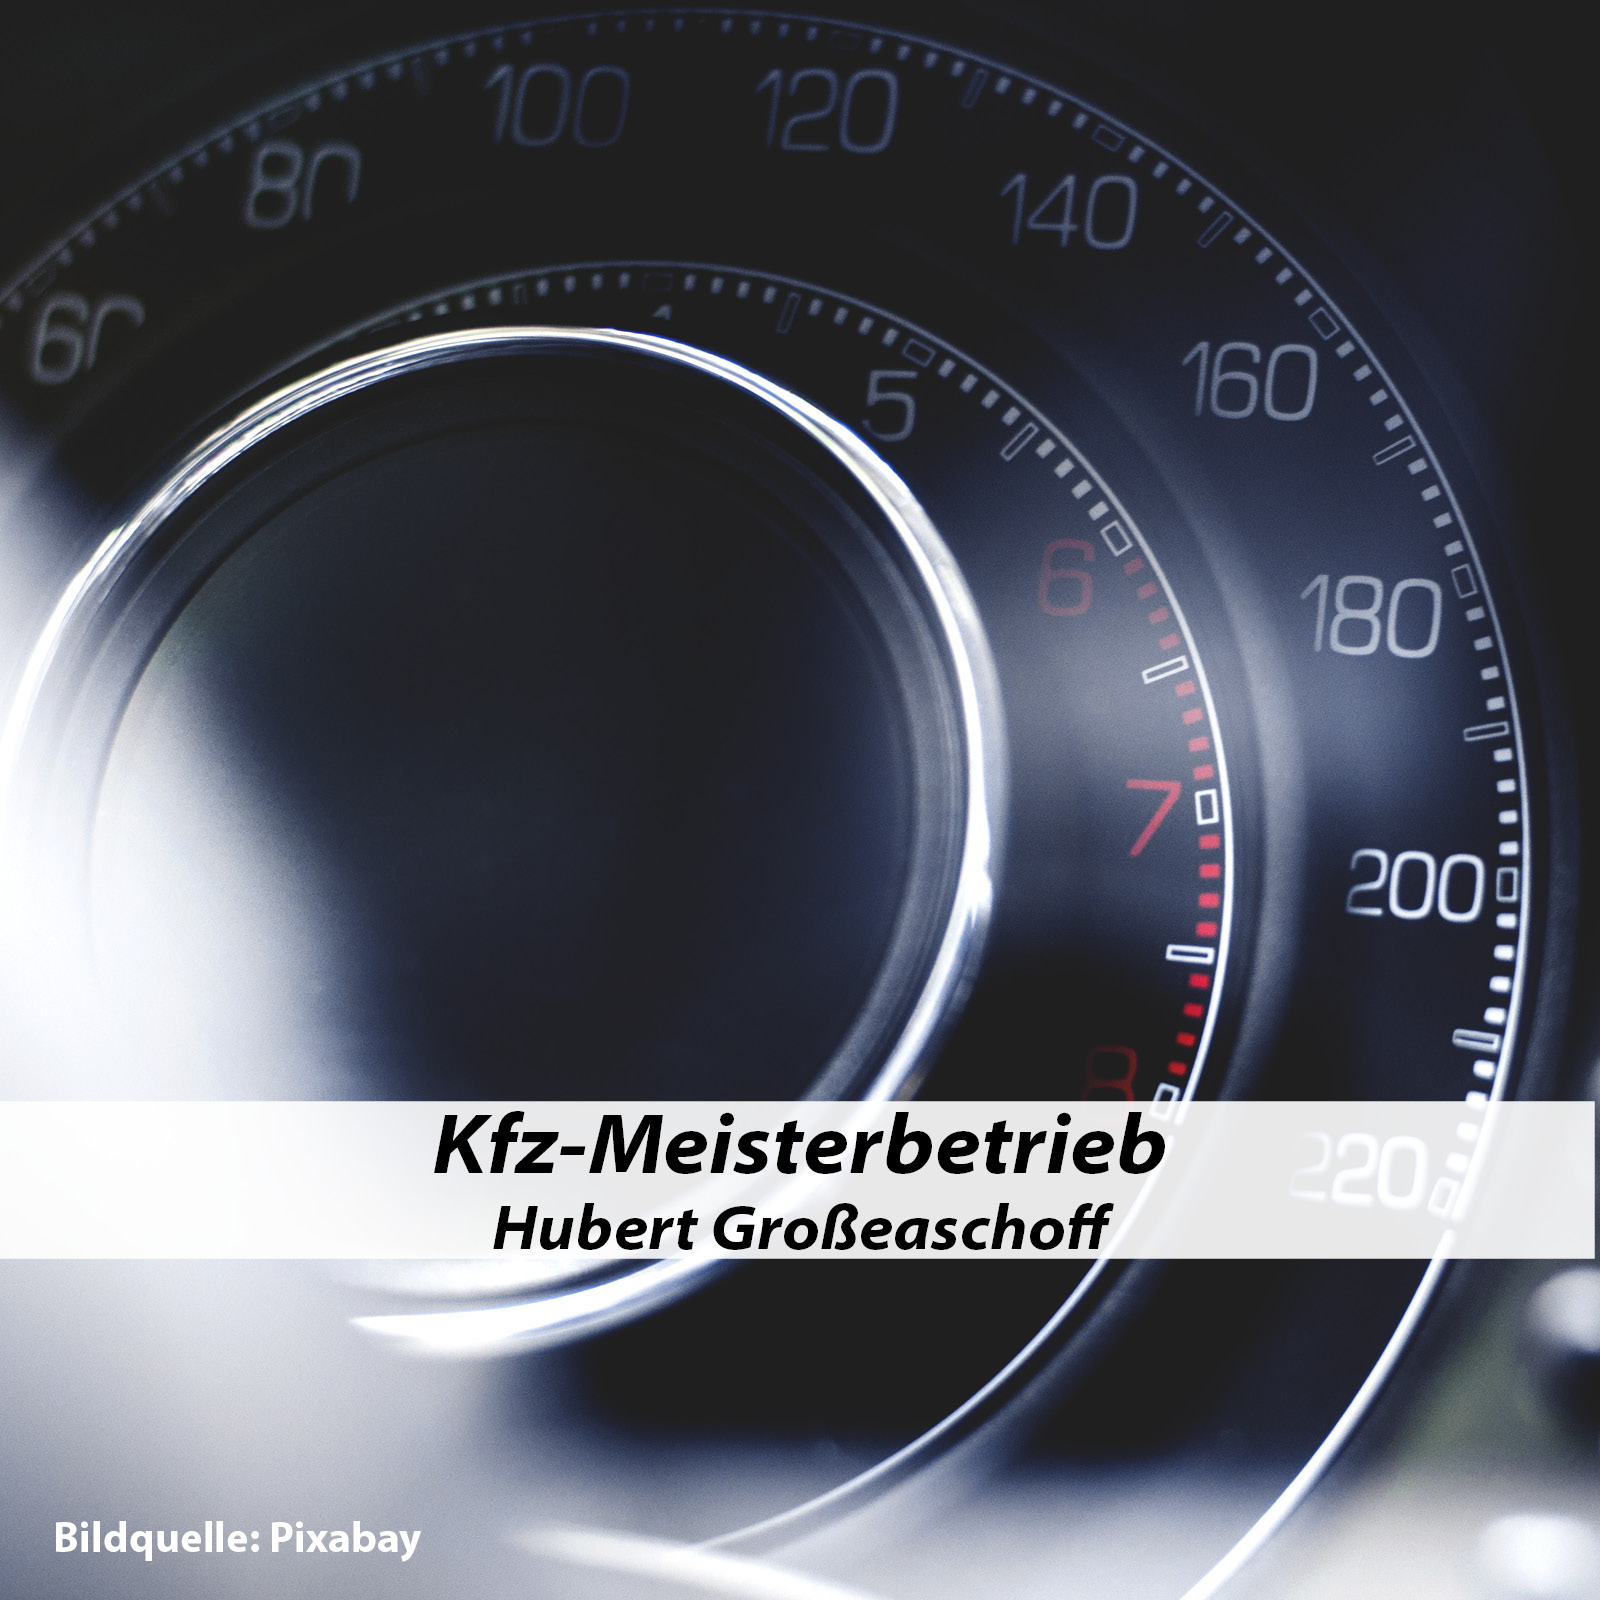 Kfz-Meisterbetrieb Hubert Großeaschoff